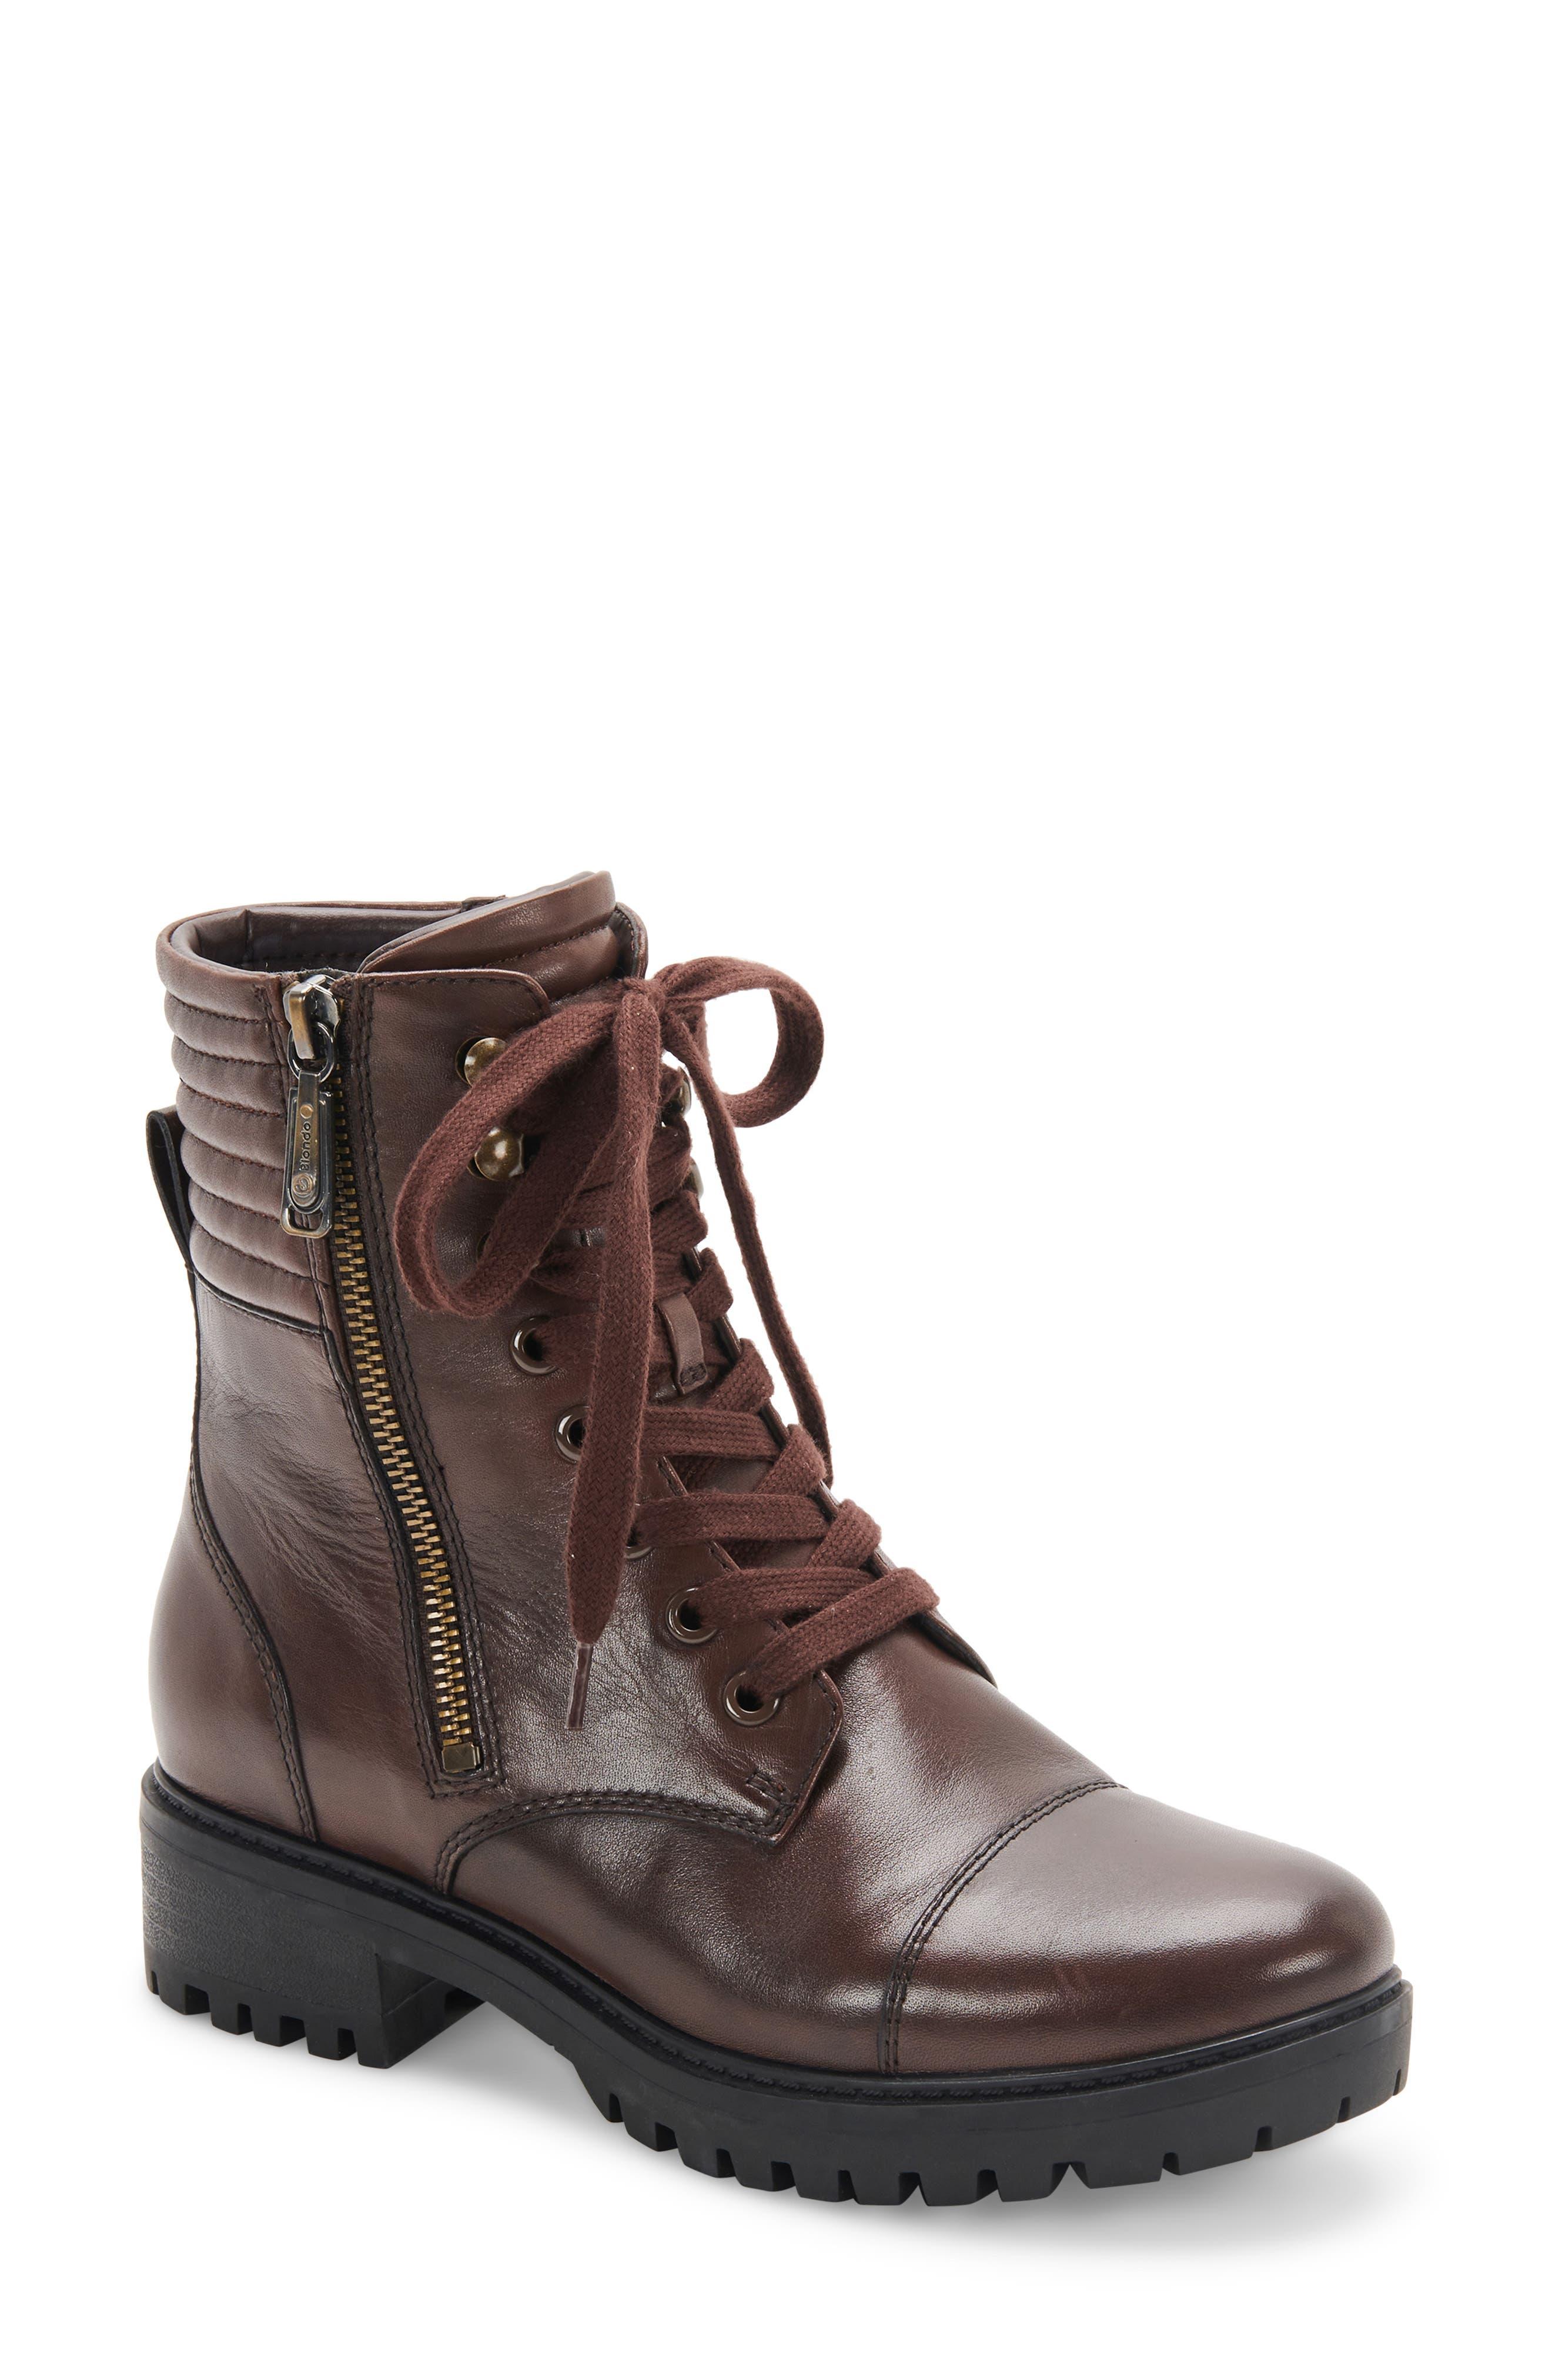 Mady Waterproof Lace-Up Boot